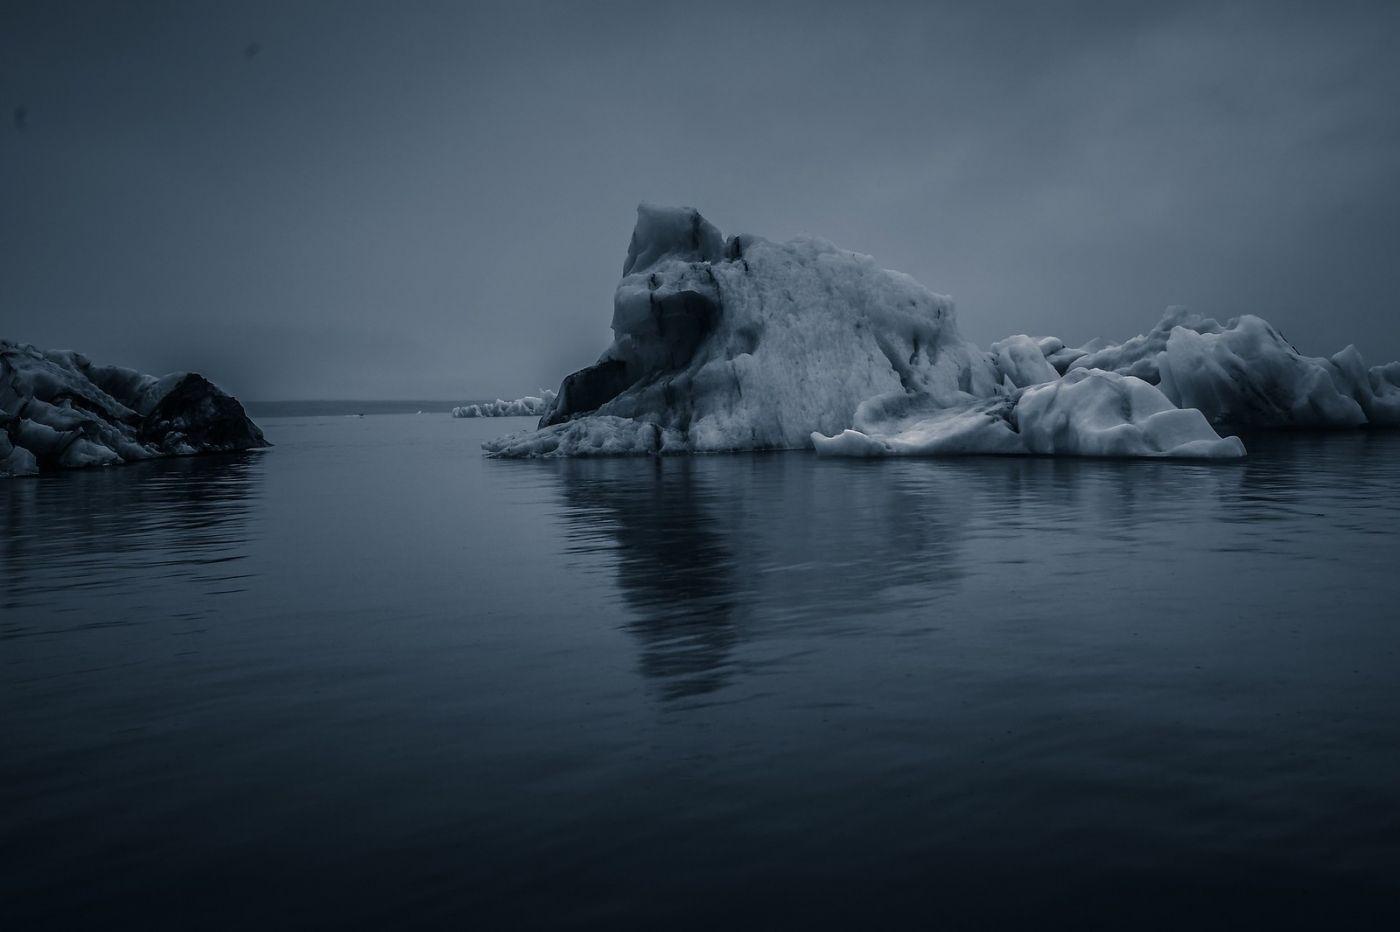 冰岛冰川泻湖(Glacier Lagoon),流动的冰川_图1-18